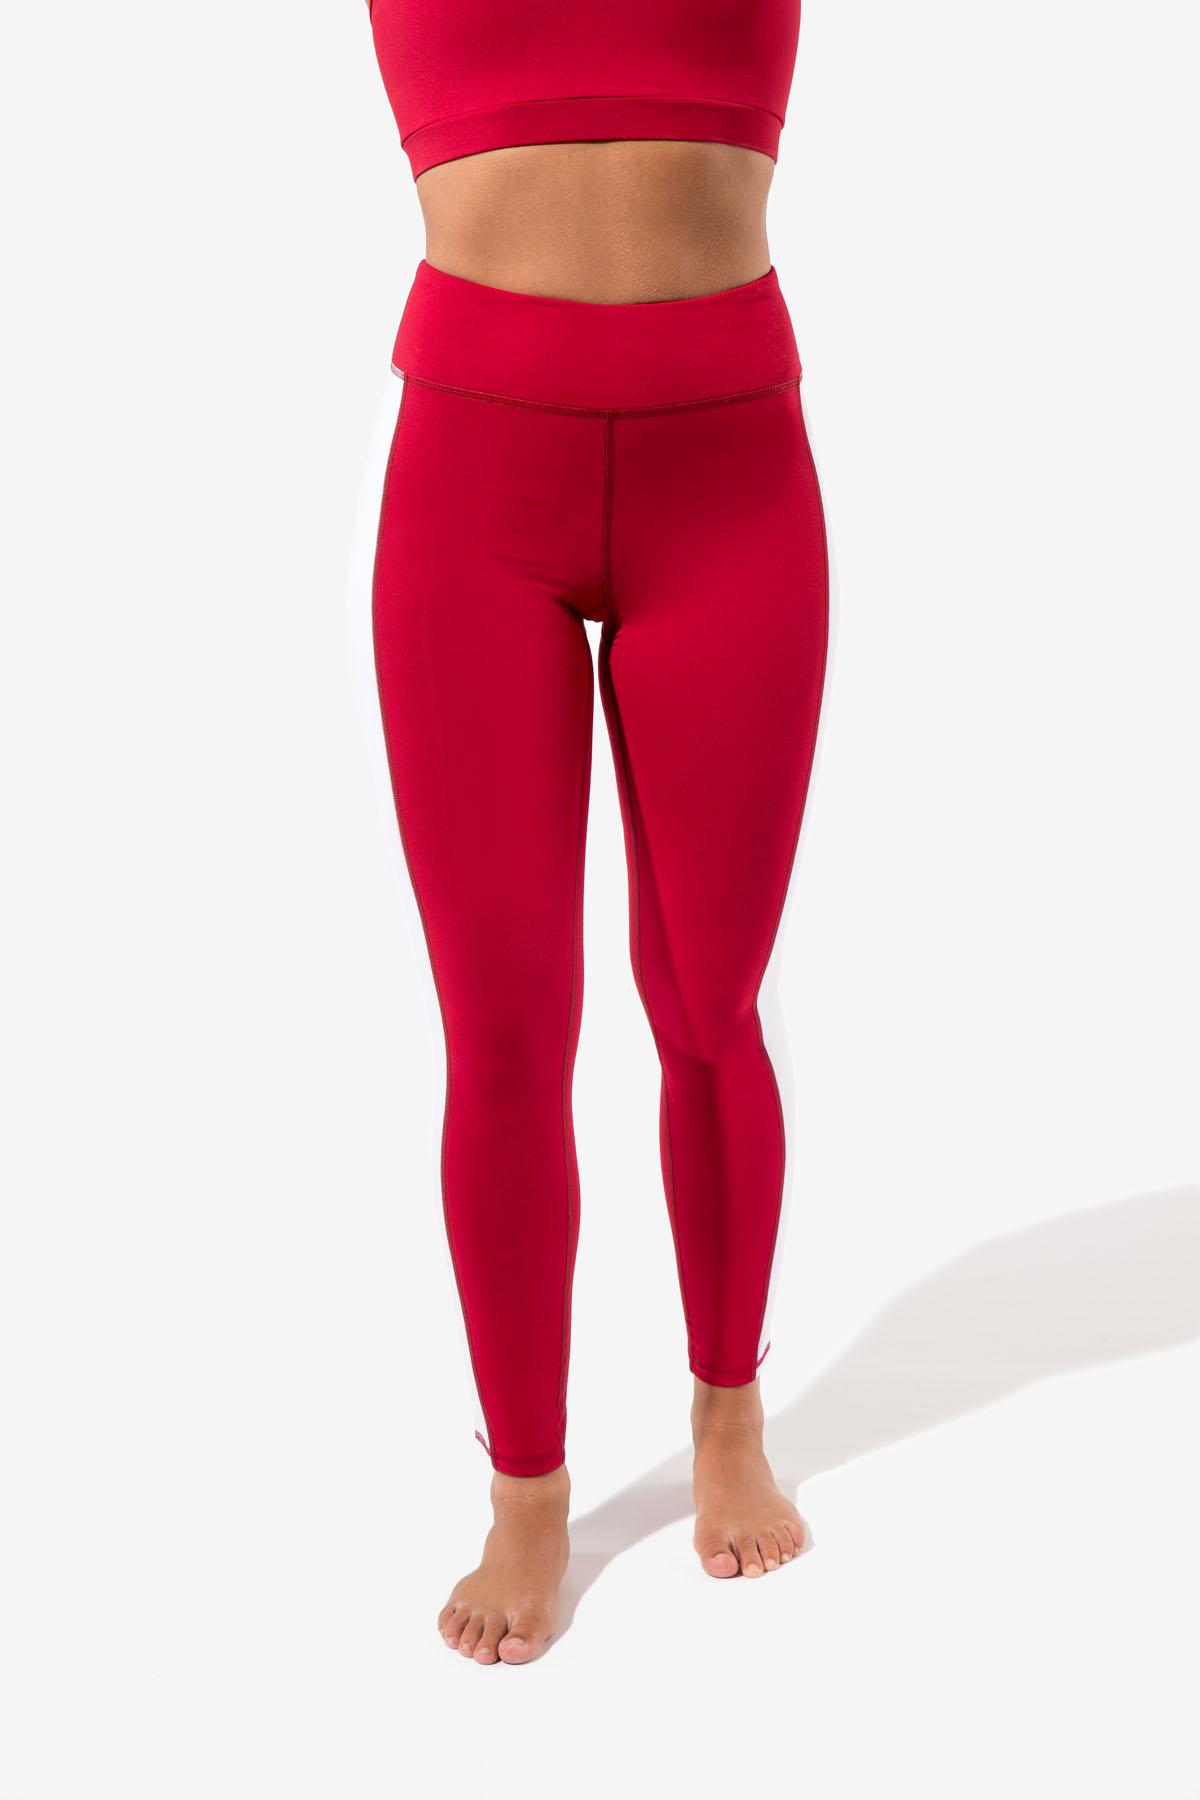 ac3bb2c849fa9 Cetara Side Panel Leggings – Red   White – Certo Apparel – Leggings ...